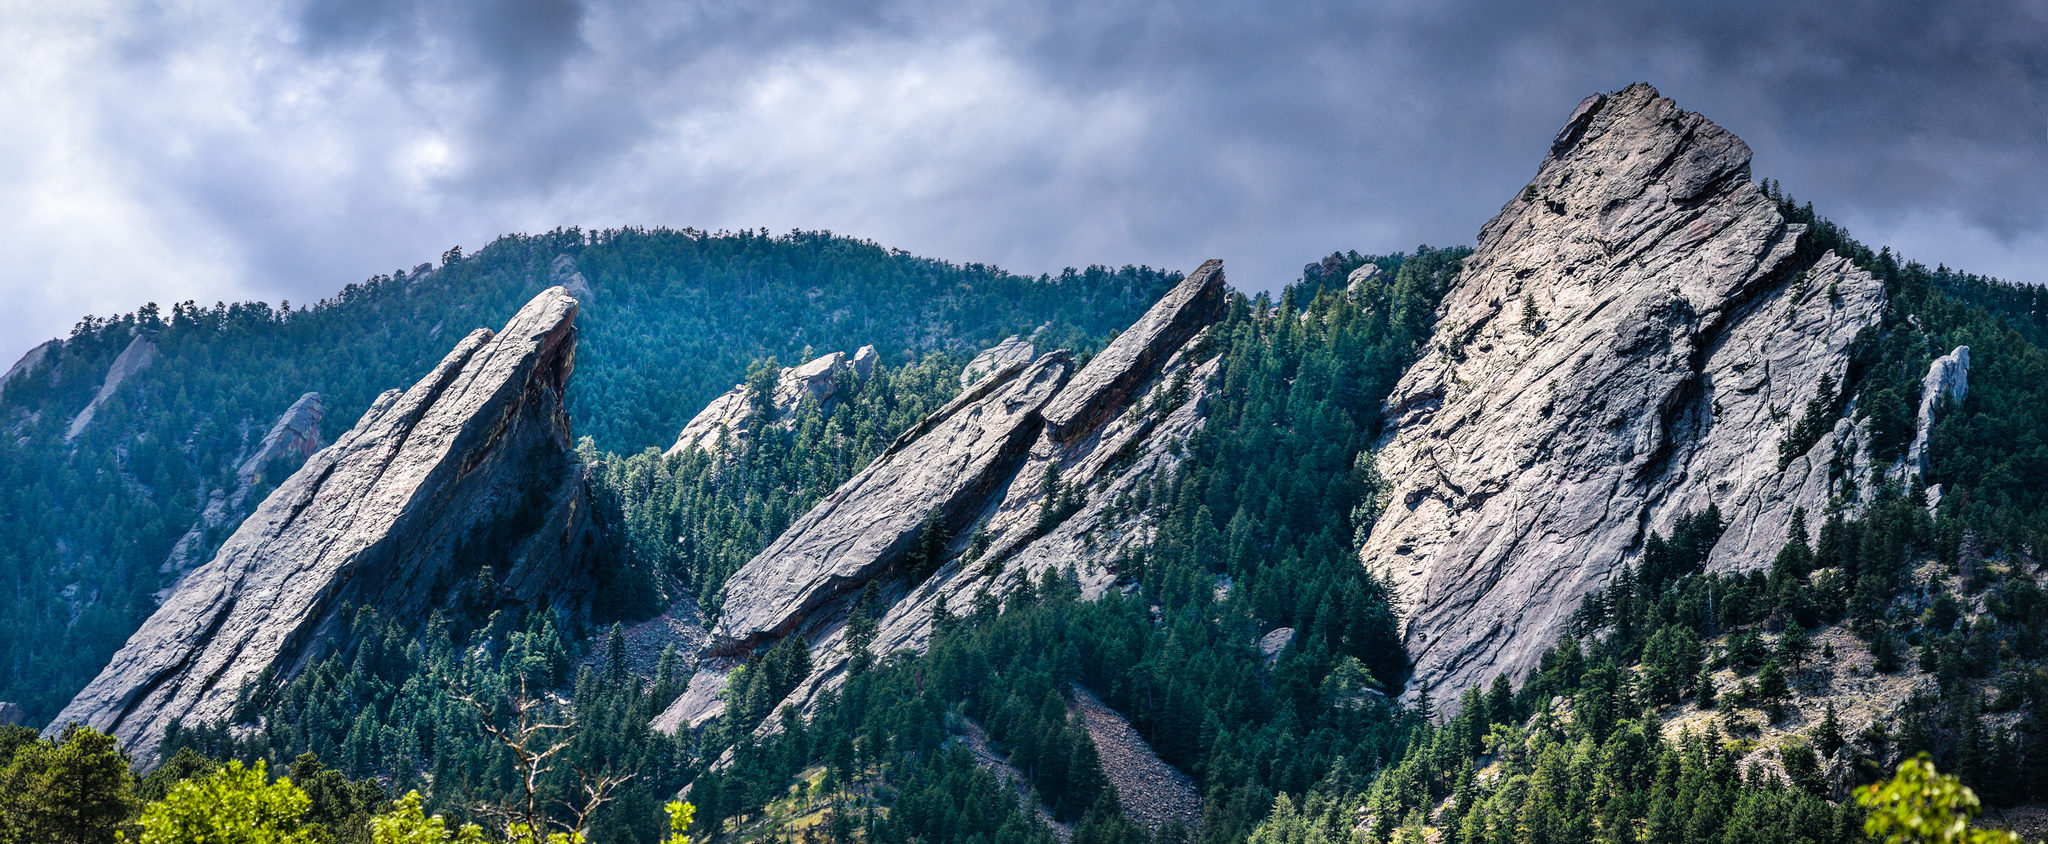 Boulder-Flatirons-Image